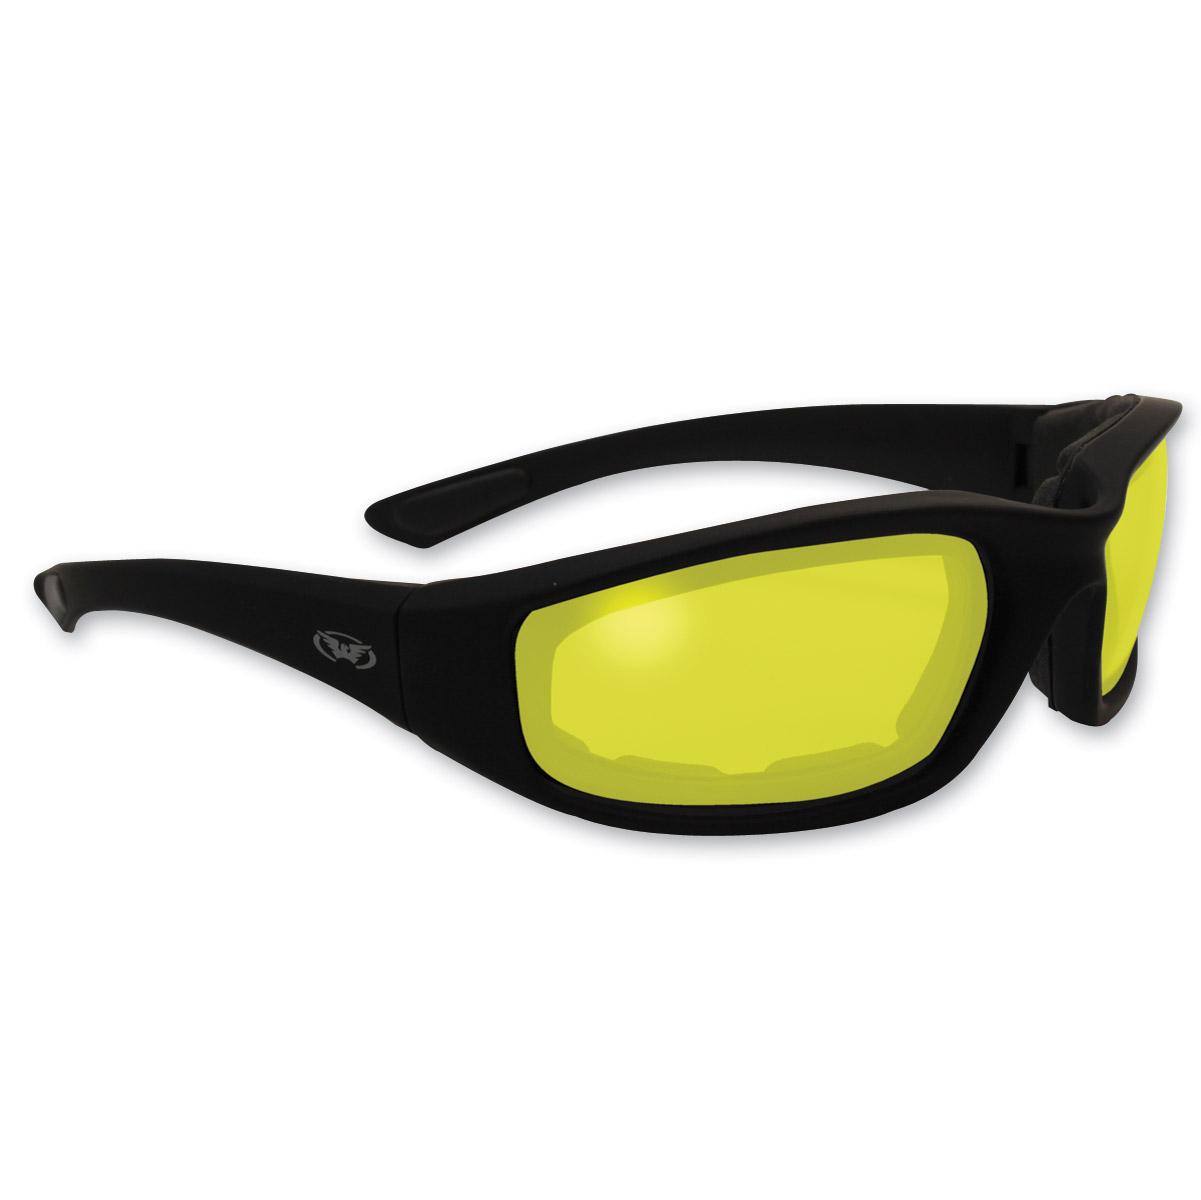 Global Vision Eyewear Kickback Yellow Lens Photochromic Sunglasses